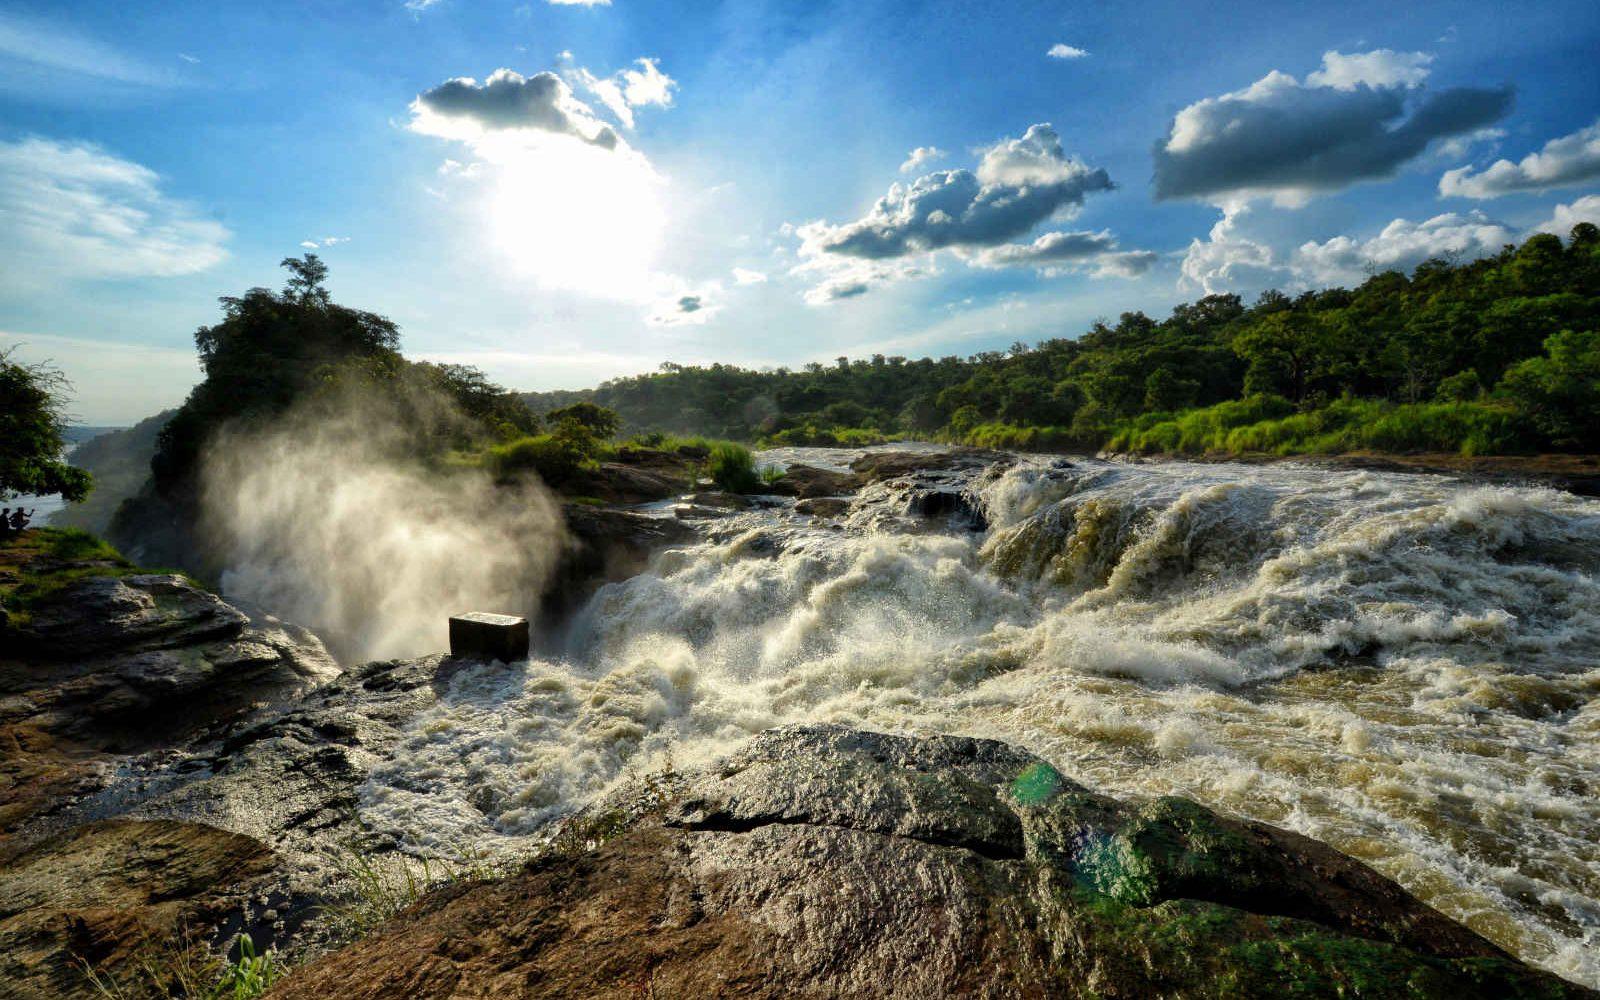 Dépôt de marque en Ouganda